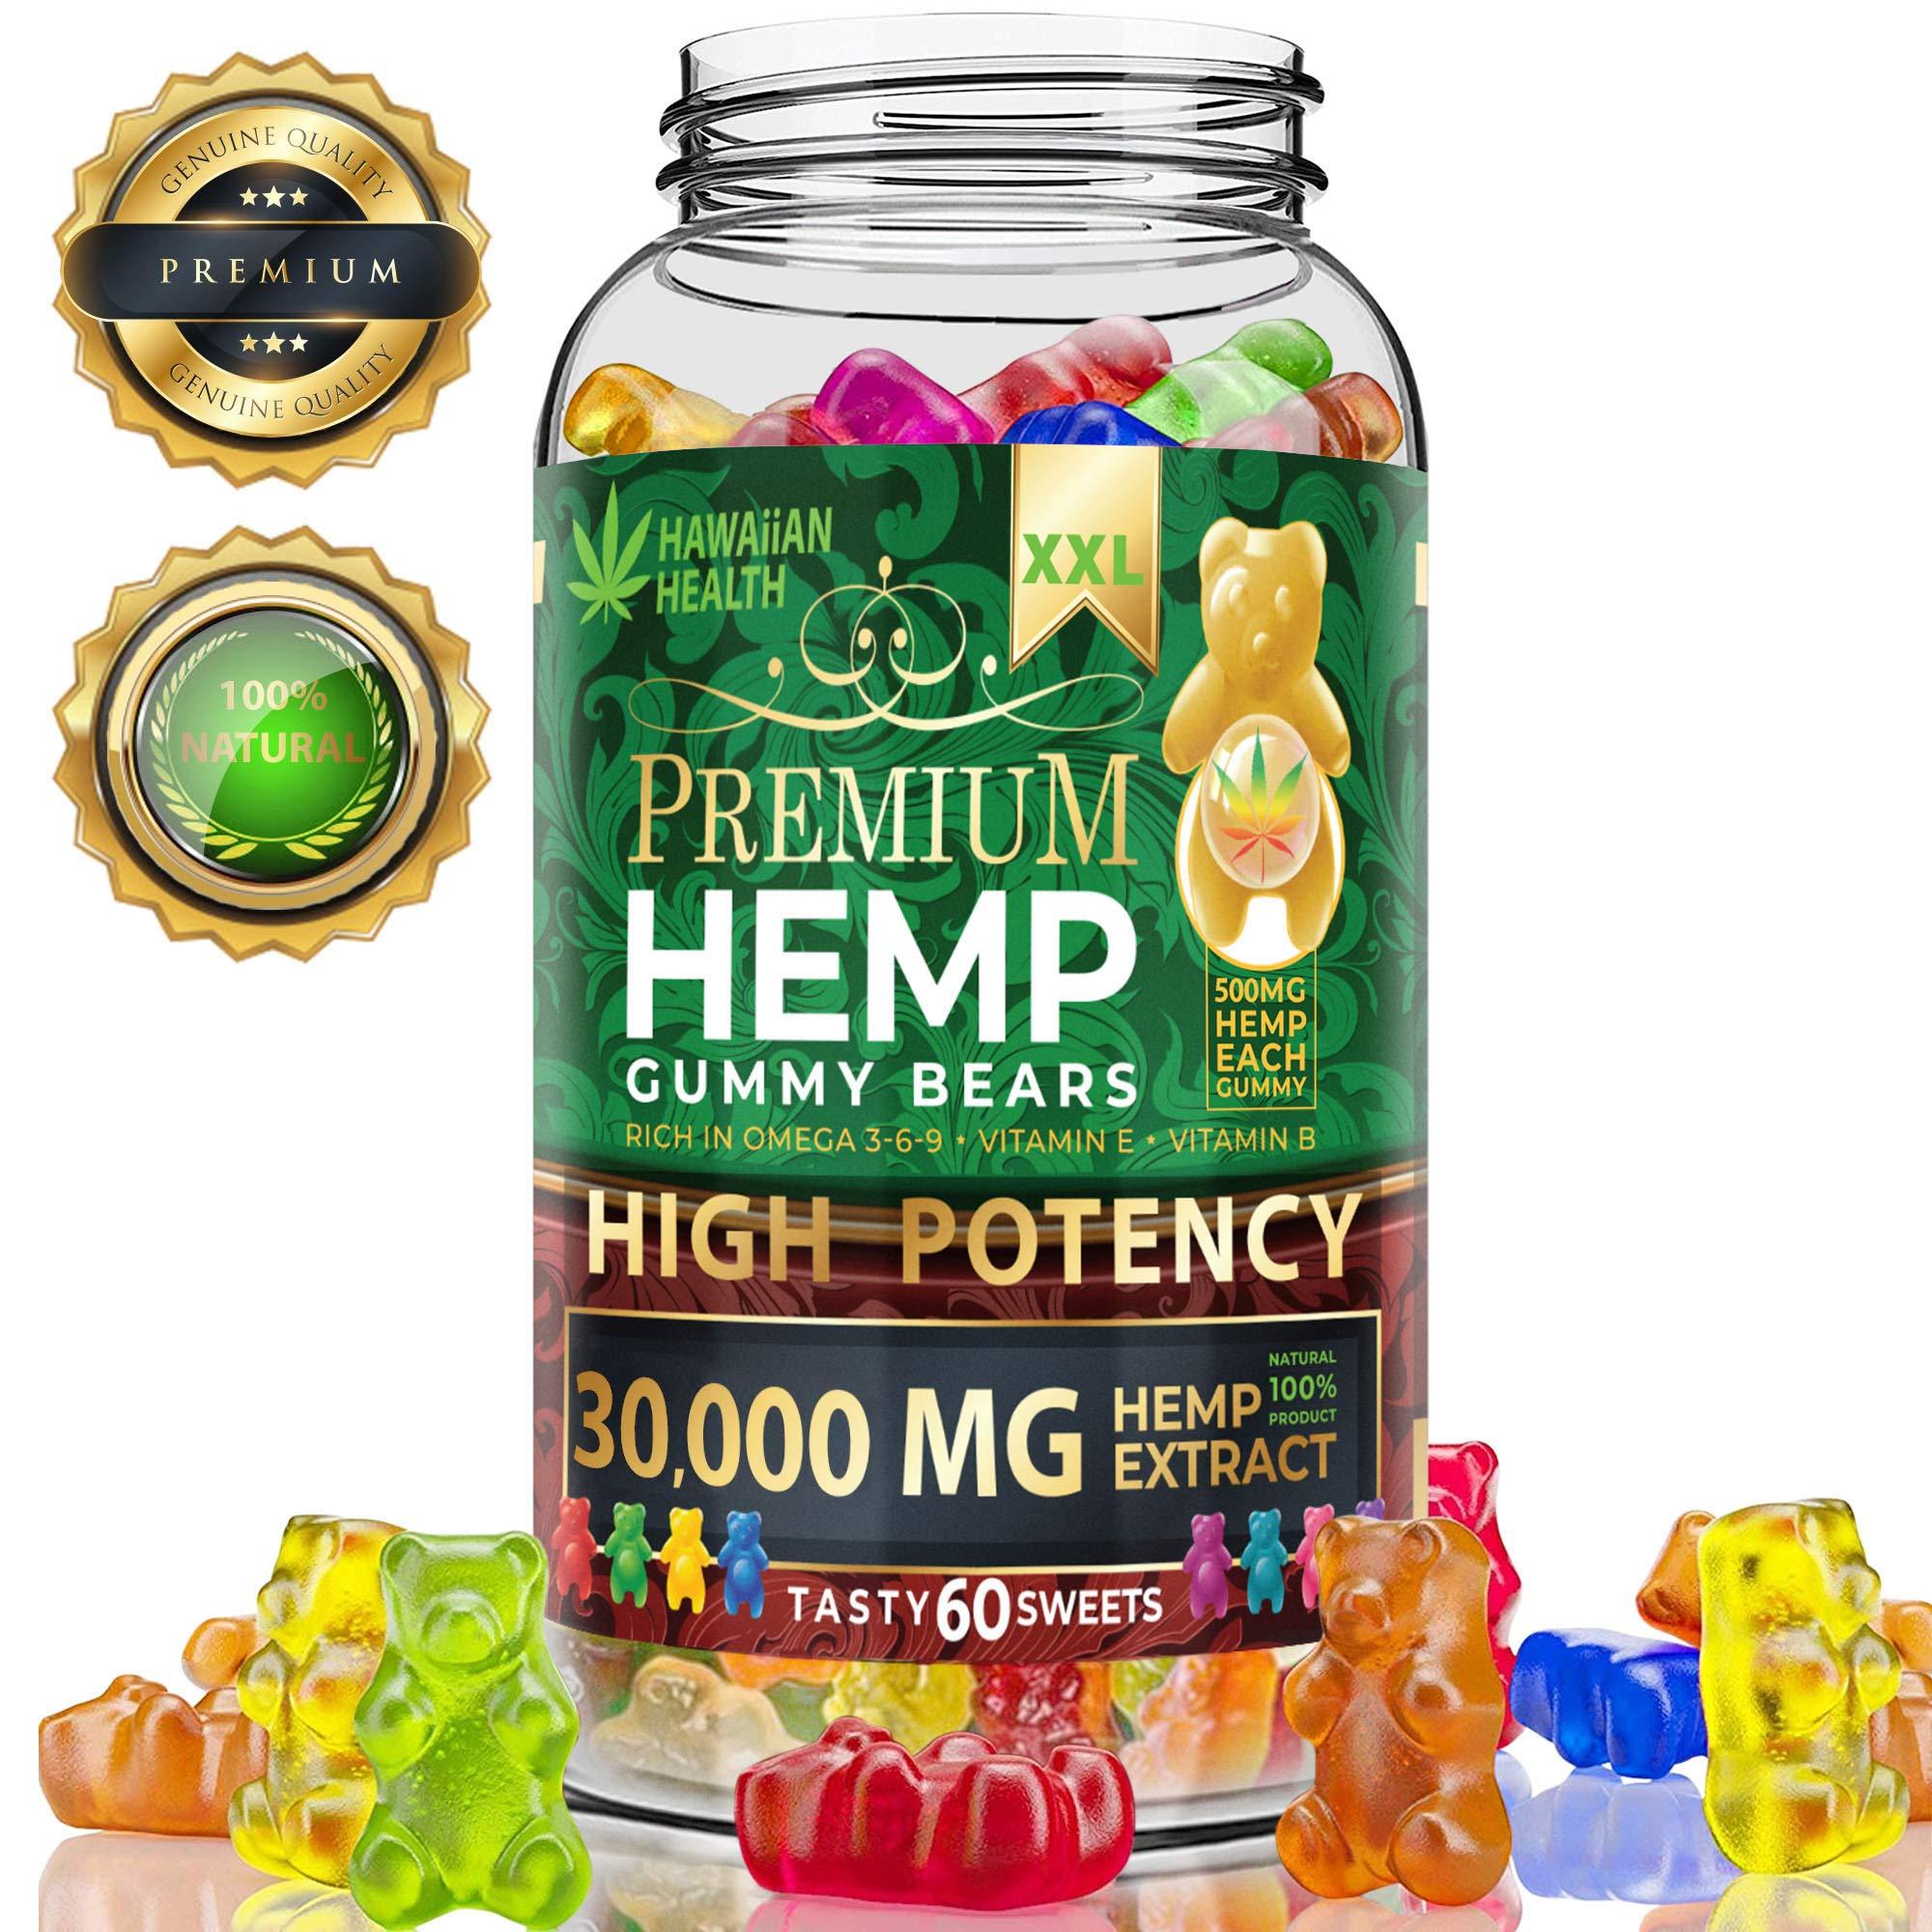 Hemp Gummies Premium XXL 300000 High Potency – Fruity Gummy Bear with Hemp Oil | Natural Hemp Candy Supplements for Pain, Anxiety, Stress & Inflammation Relief | Promotes Sleep & Calm Mooв